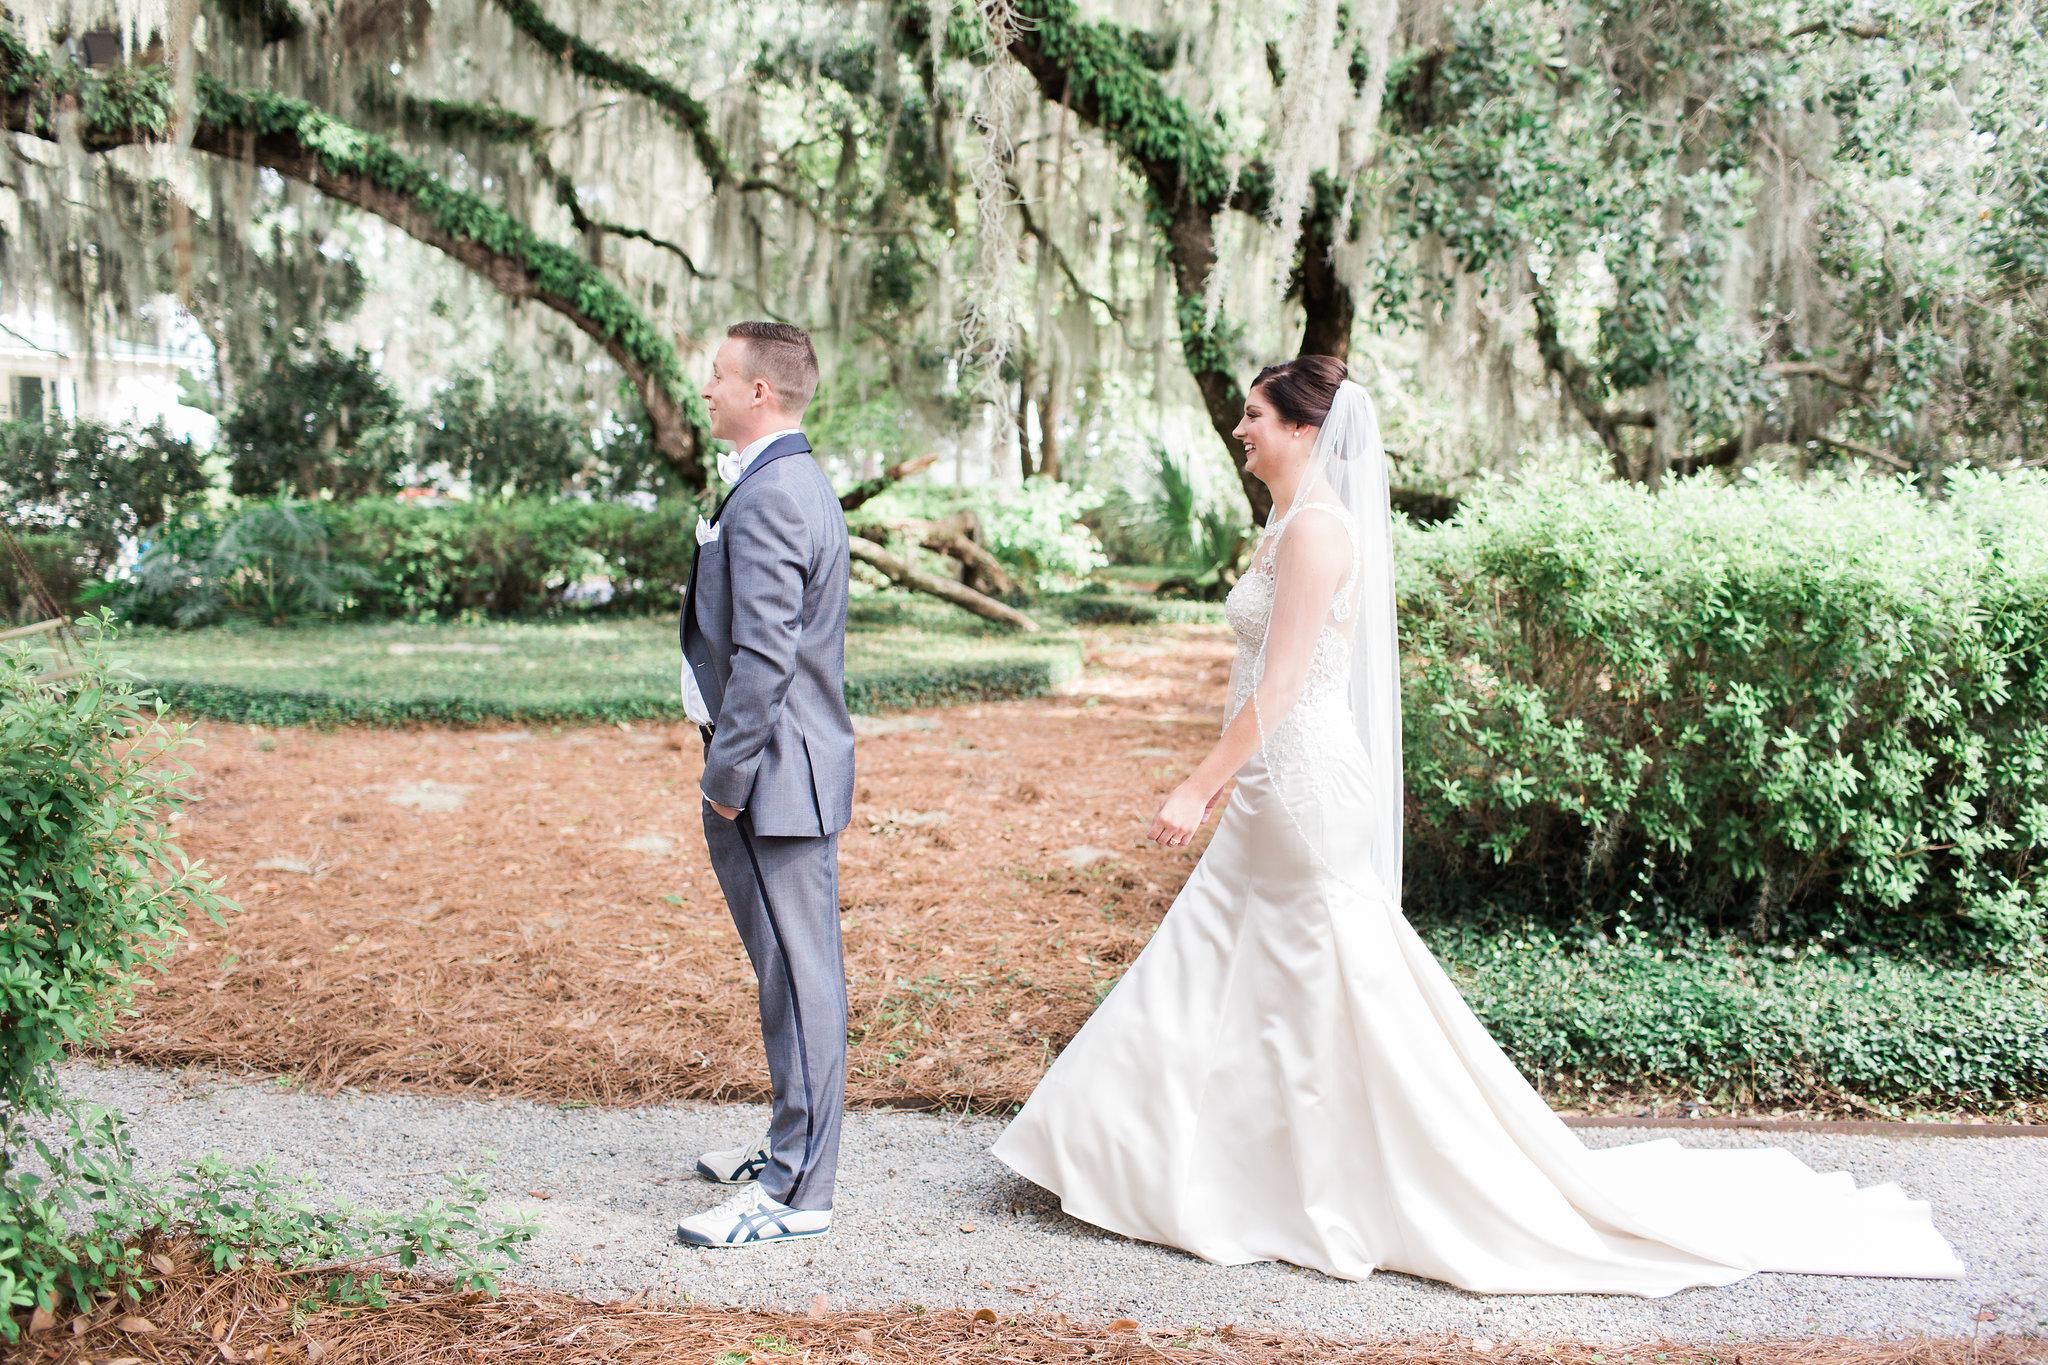 apt-b-photography-lauren-graham-oldfield-wedding-south-carolina-wedding-photographer-savannah-wedding-lowcountry-wedding-coastal-wedding-first-look-9.JPG